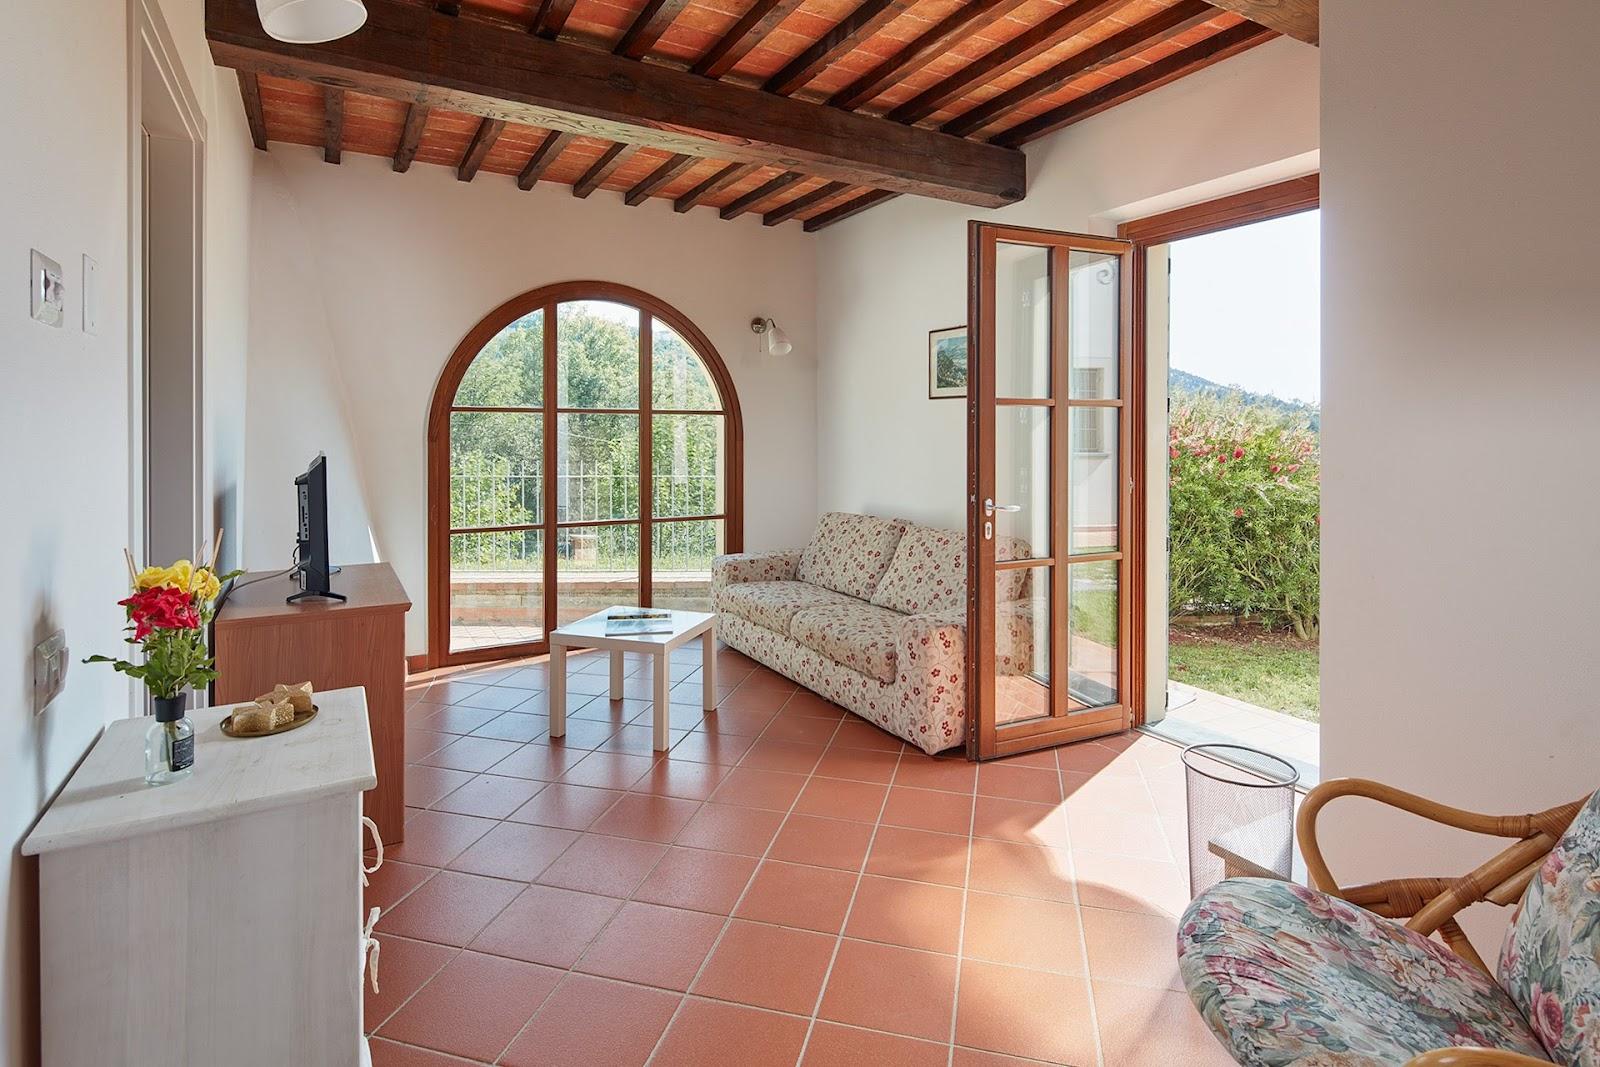 Ferienhaus Corte Paradiso (2570342), Monsummano Terme, Pistoia, Toskana, Italien, Bild 40